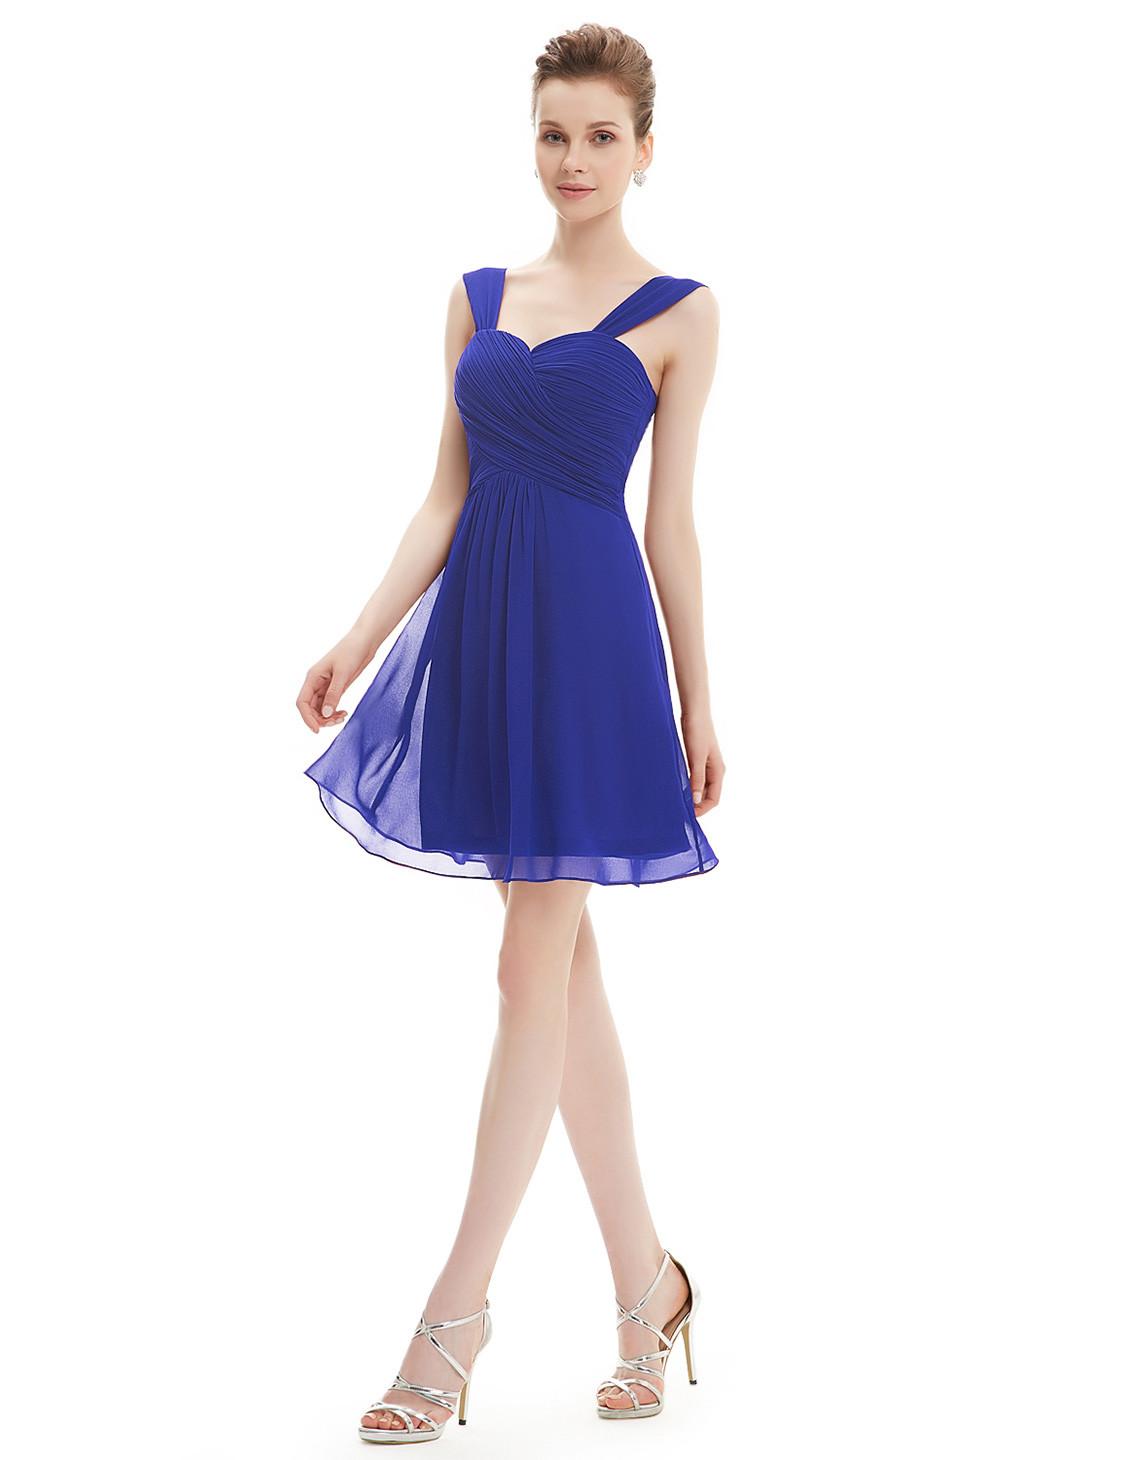 Short Royal Blue Ruffles Chiffon Bridesmaids Dress